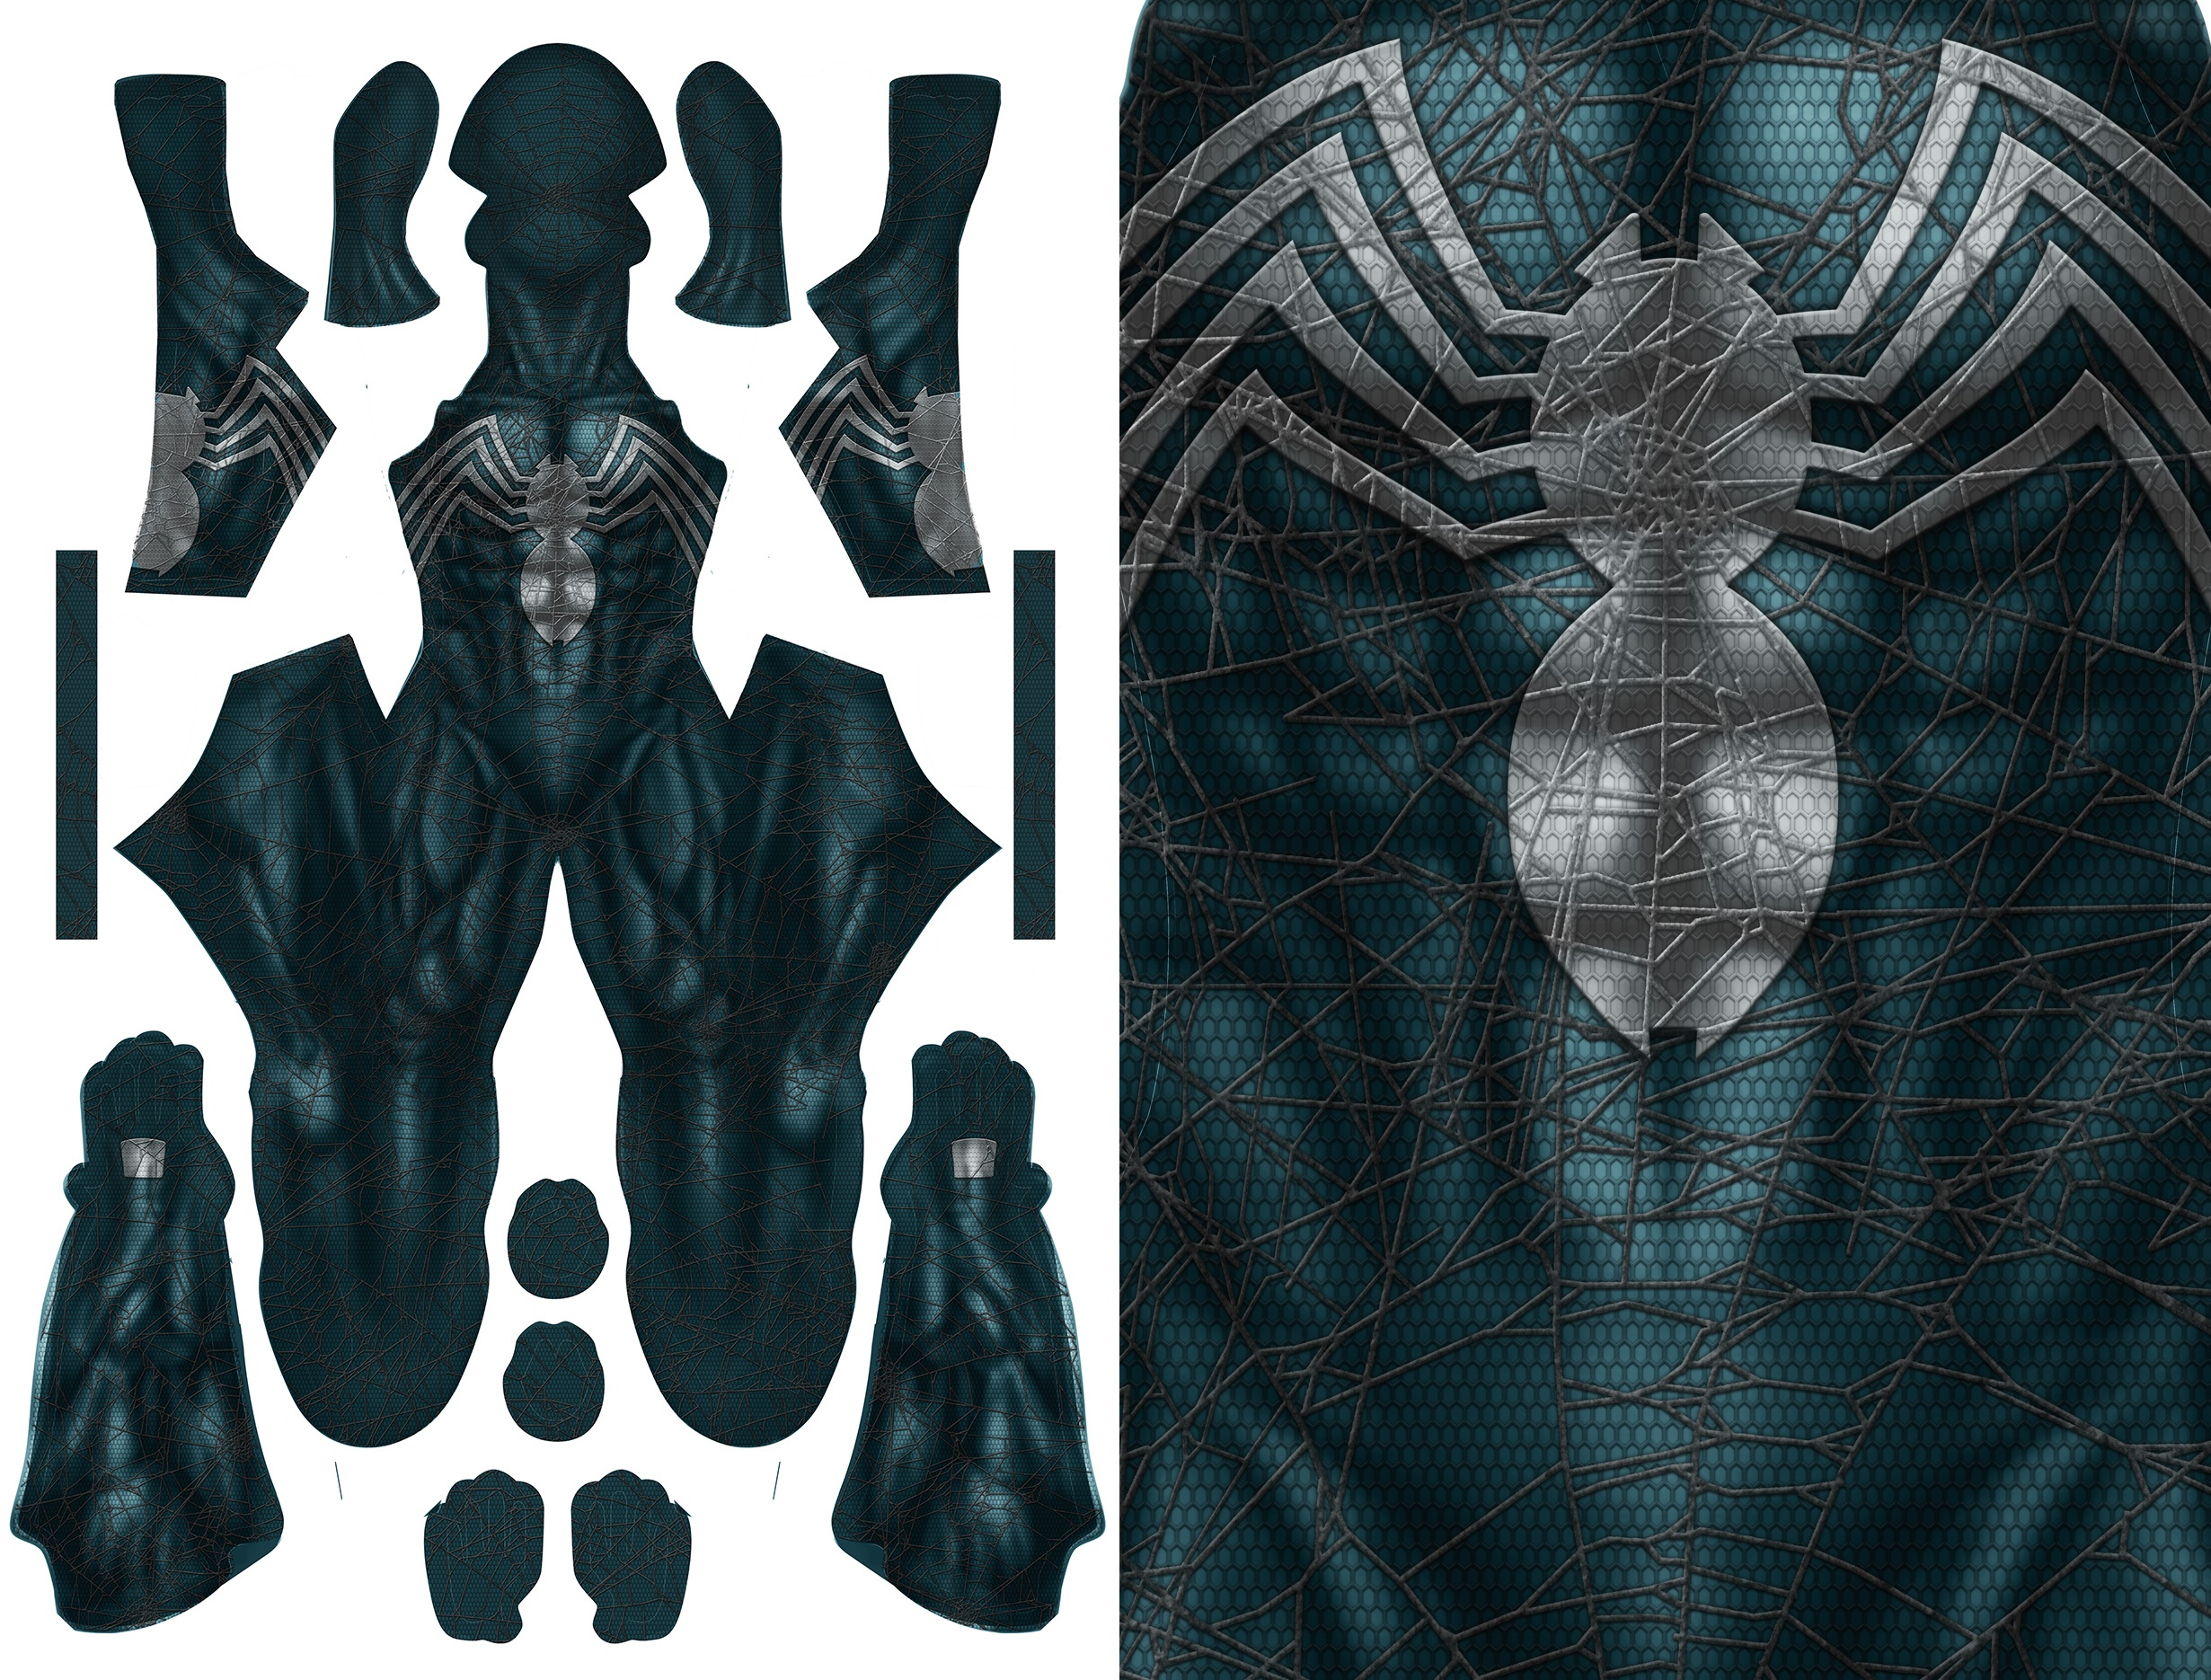 SPIDER-MAN SYMBIOTE CONCEPT pattern file